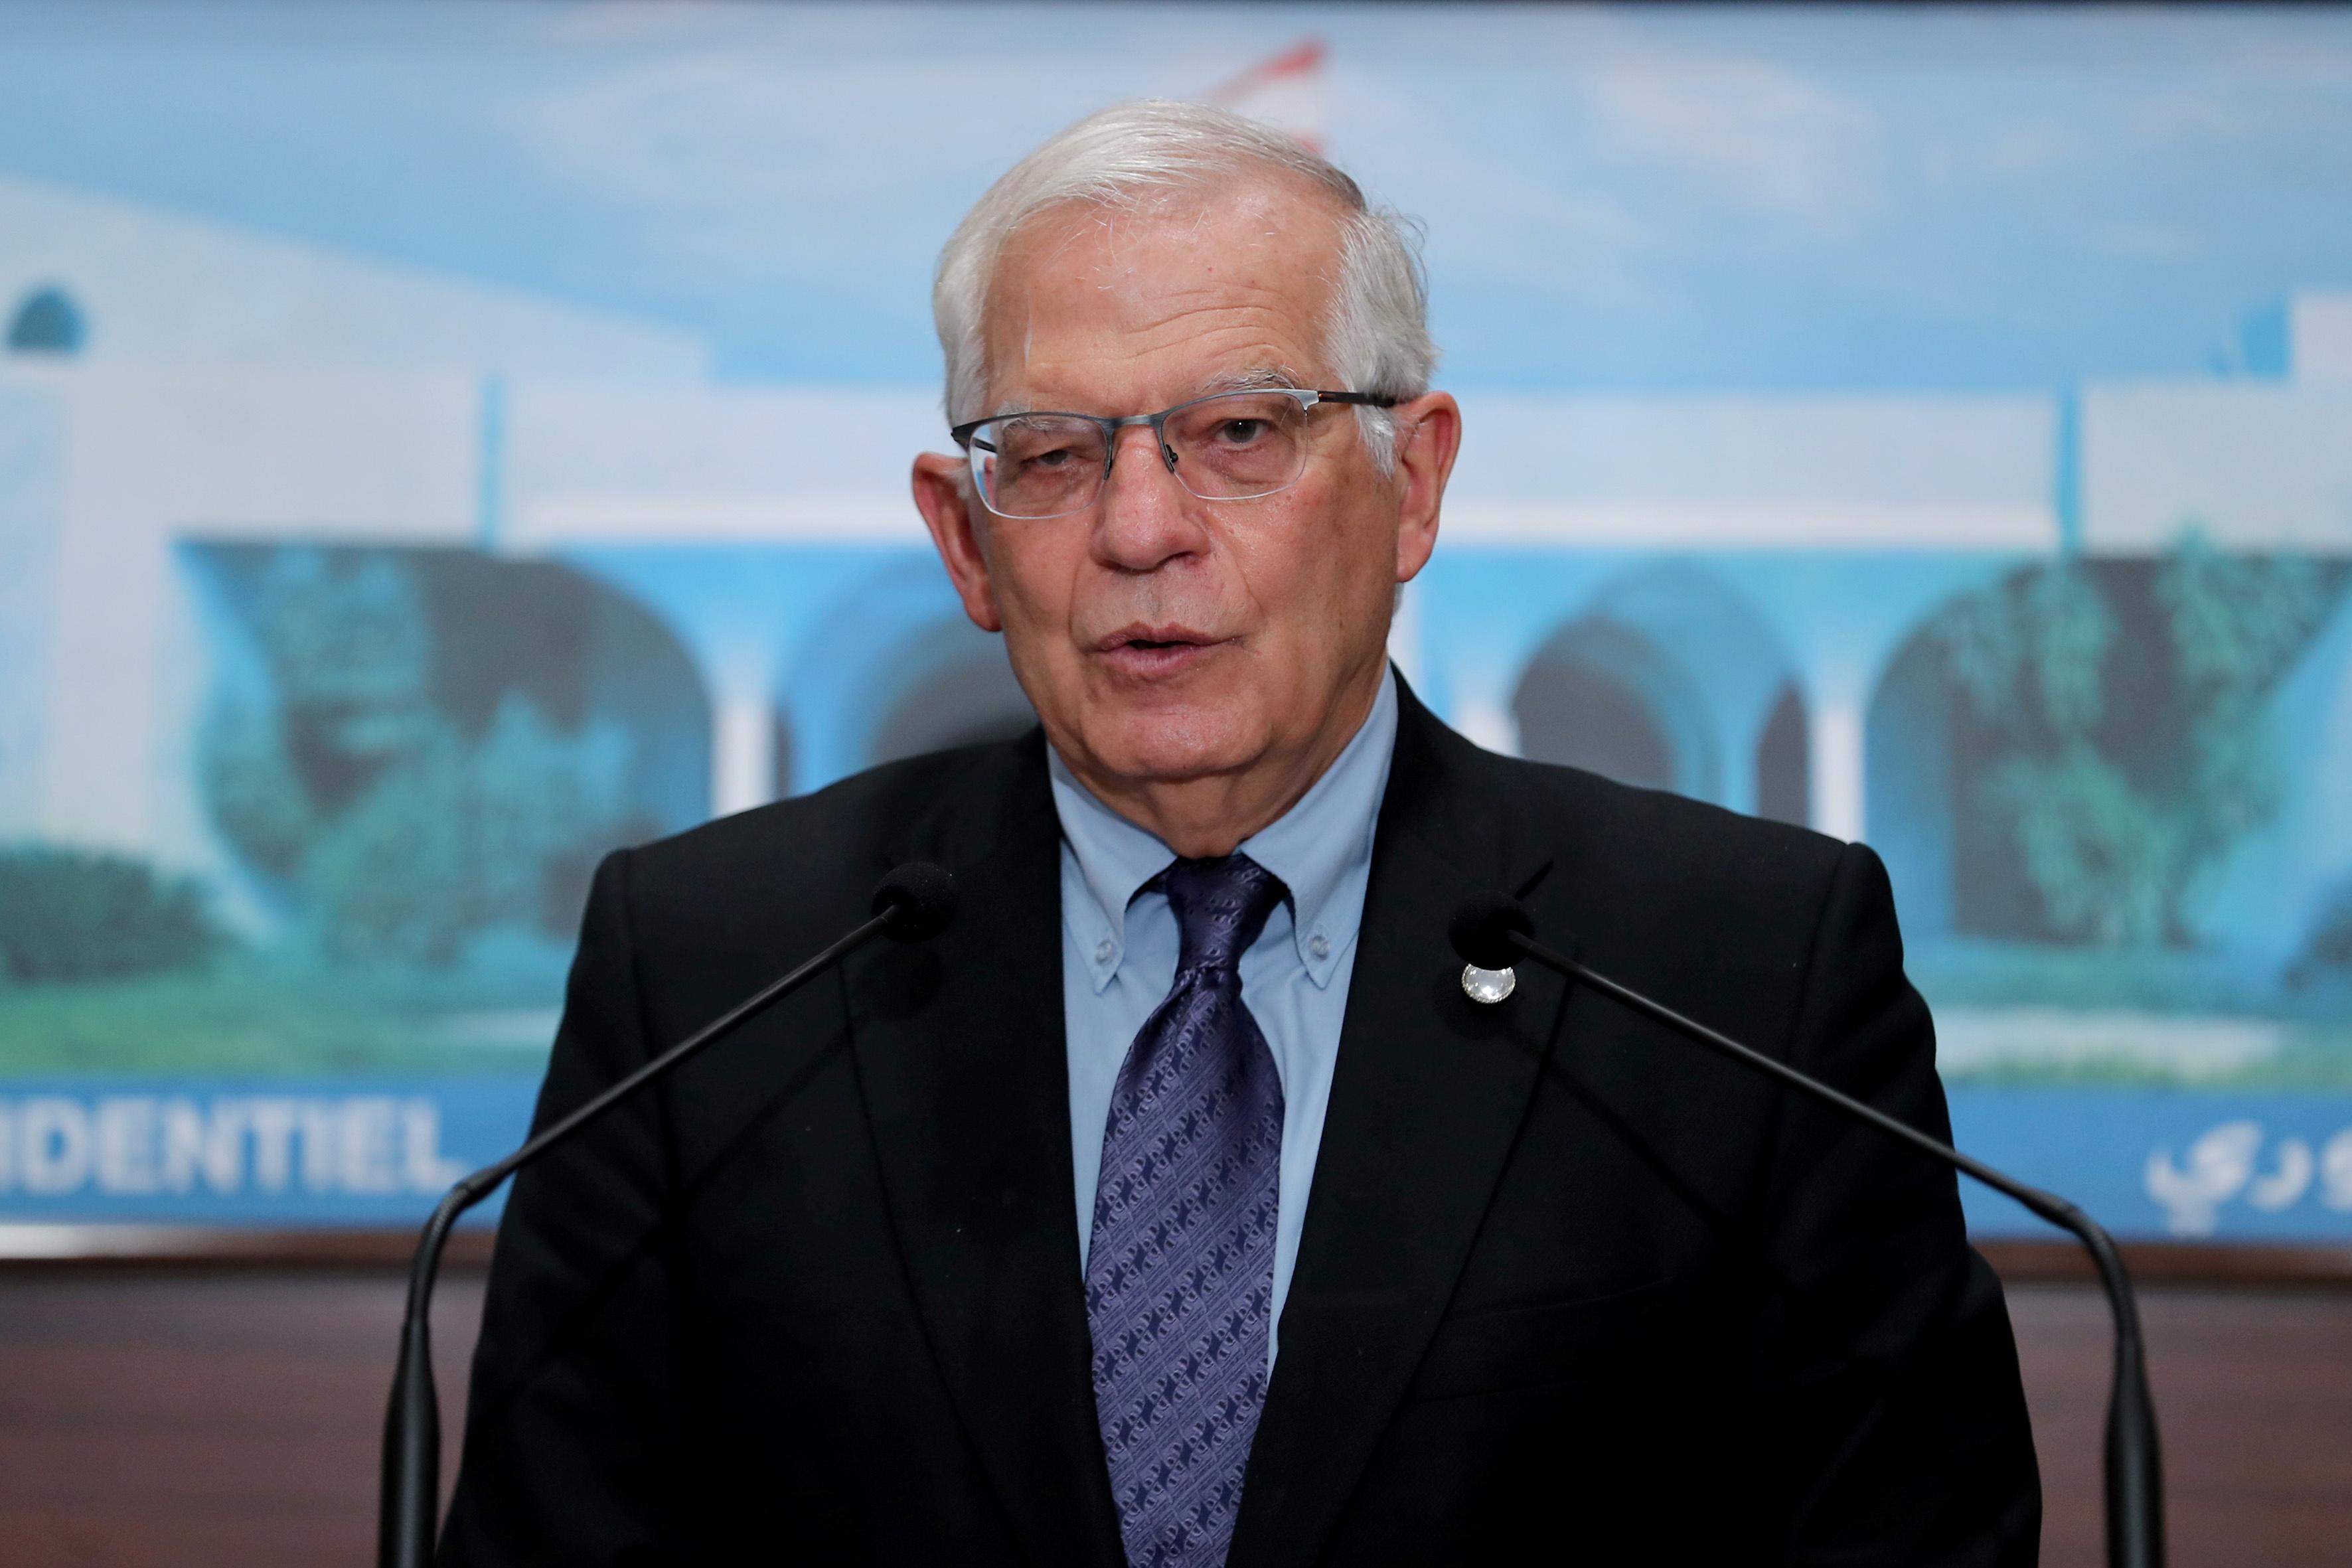 European Union foreign policy chief Josep Borrell speaks at the presidential palace in Baabda, Lebanon June 19, 2021. Dalati Nohra/Handout via REUTERS